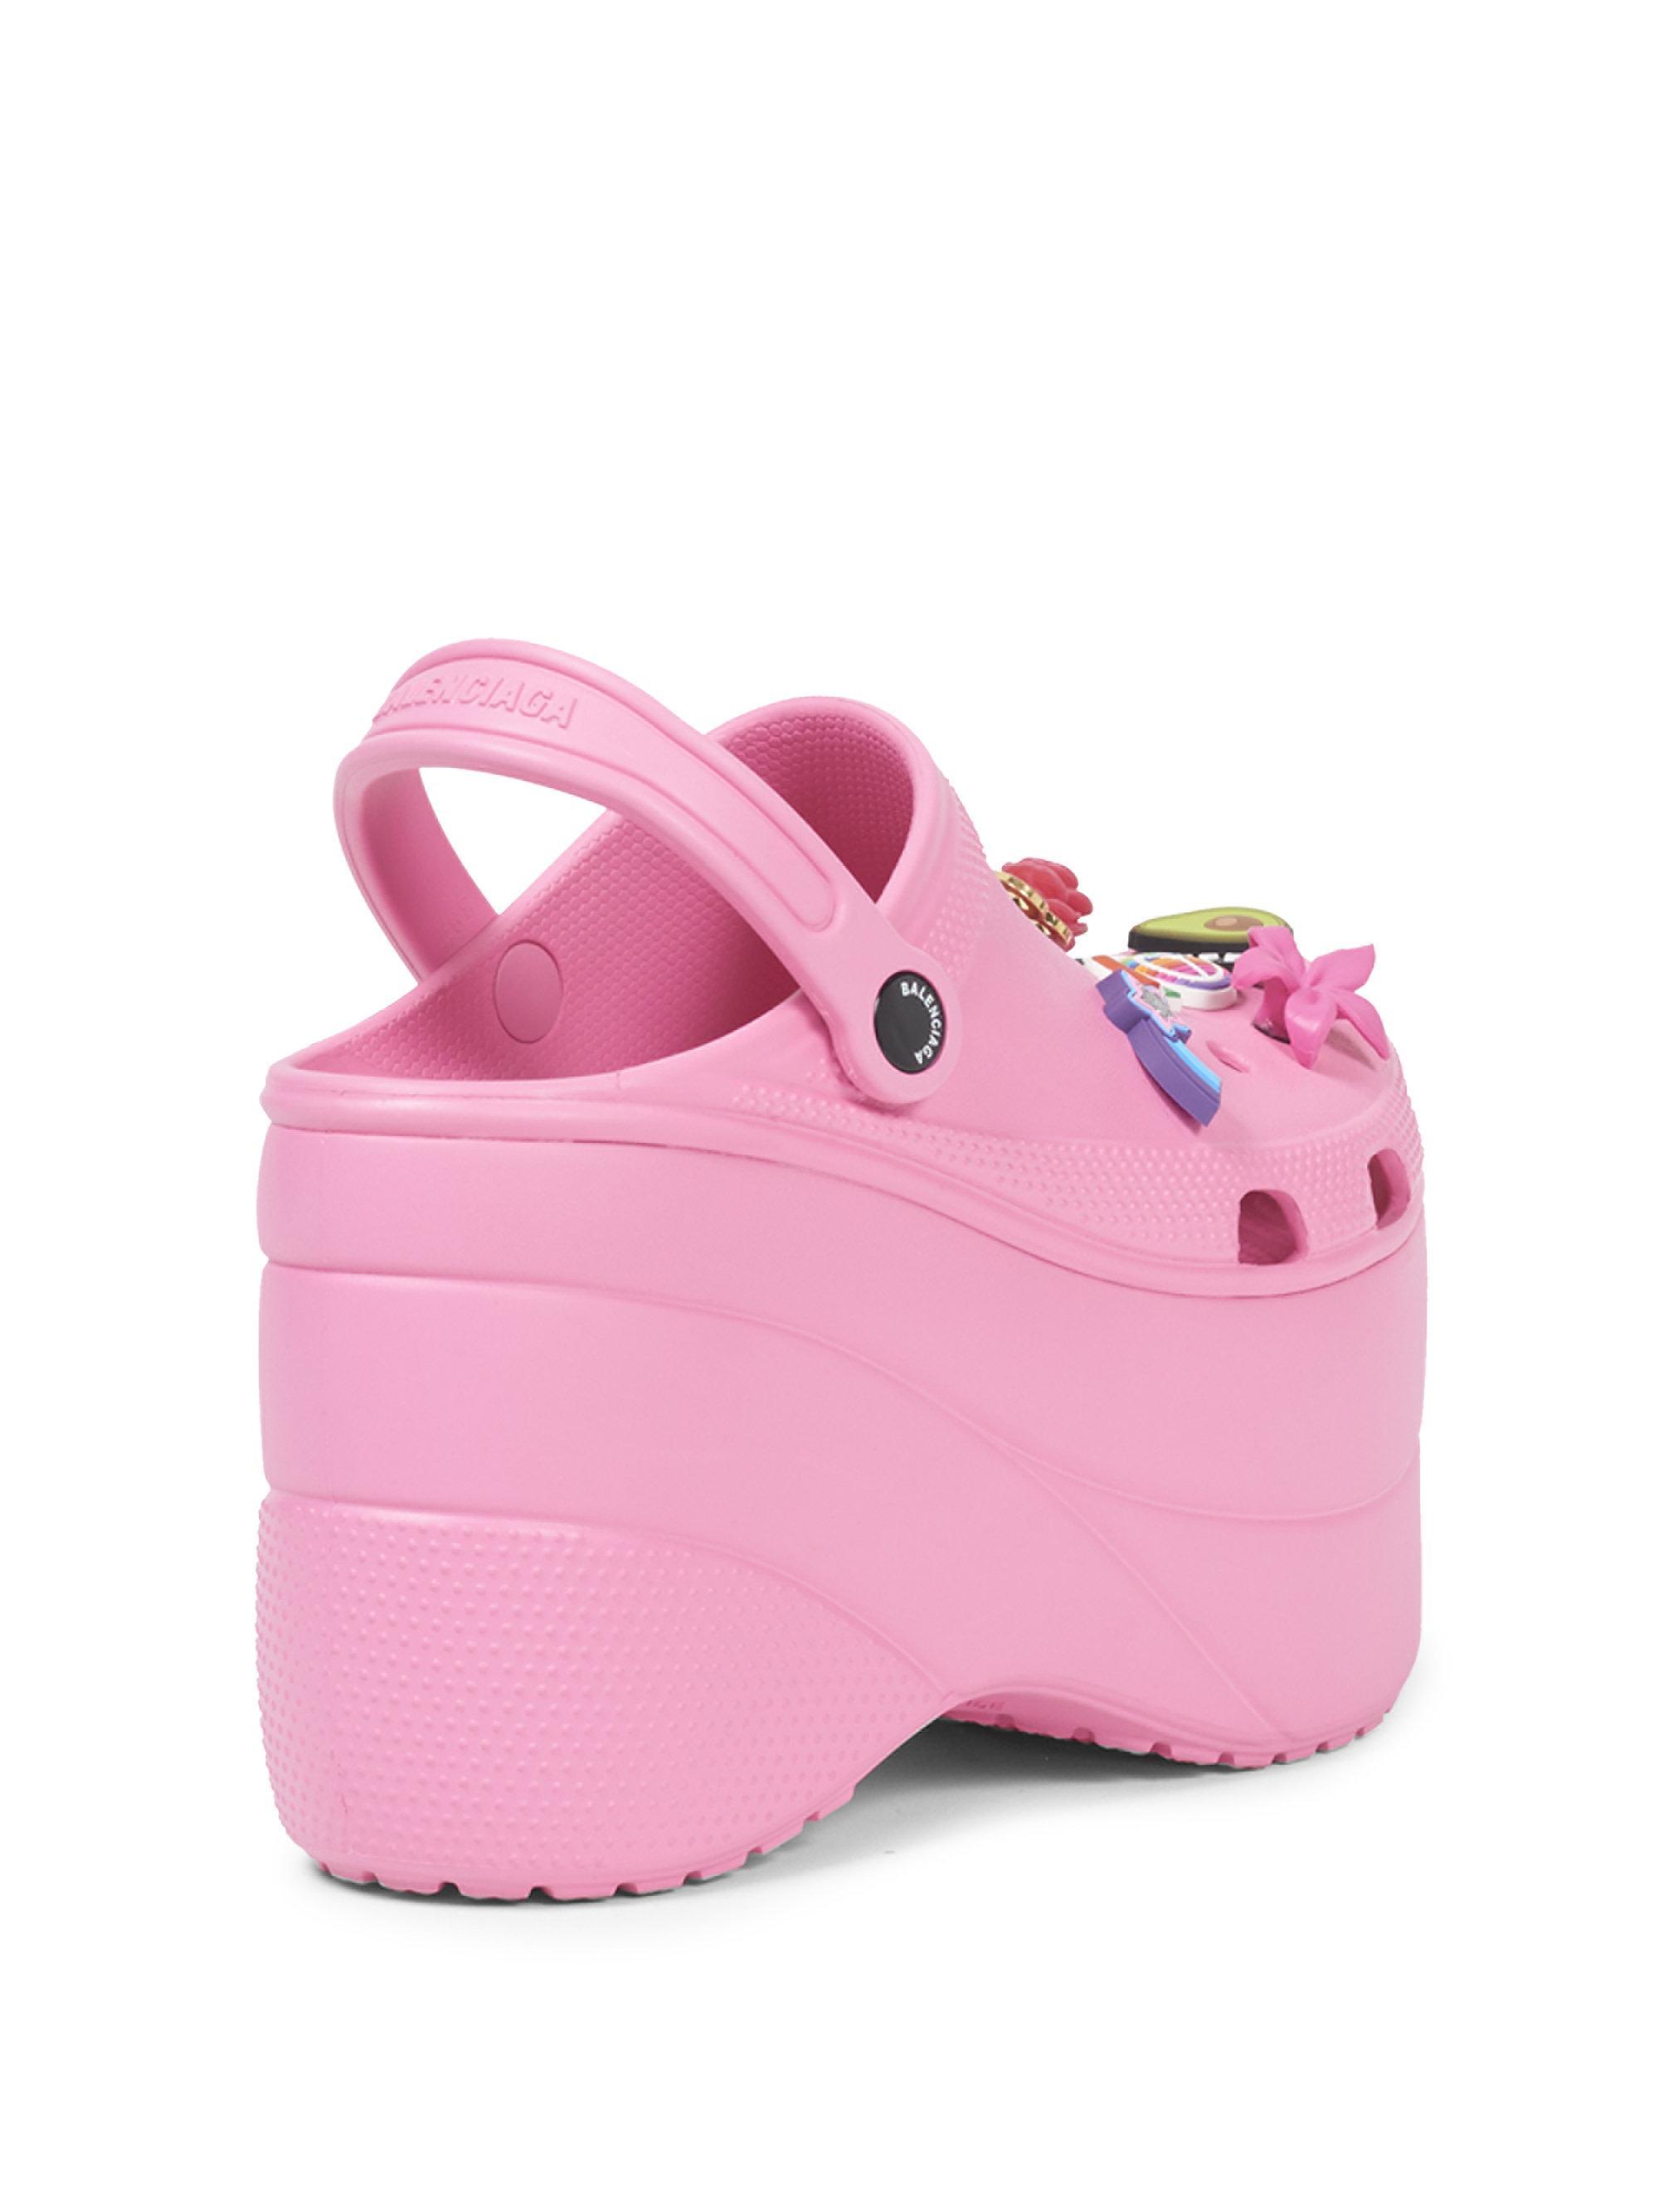 c803f30a3e5 Lyst - Balenciaga Women s Pink Foam Platforms With Charms - Size 37 ...